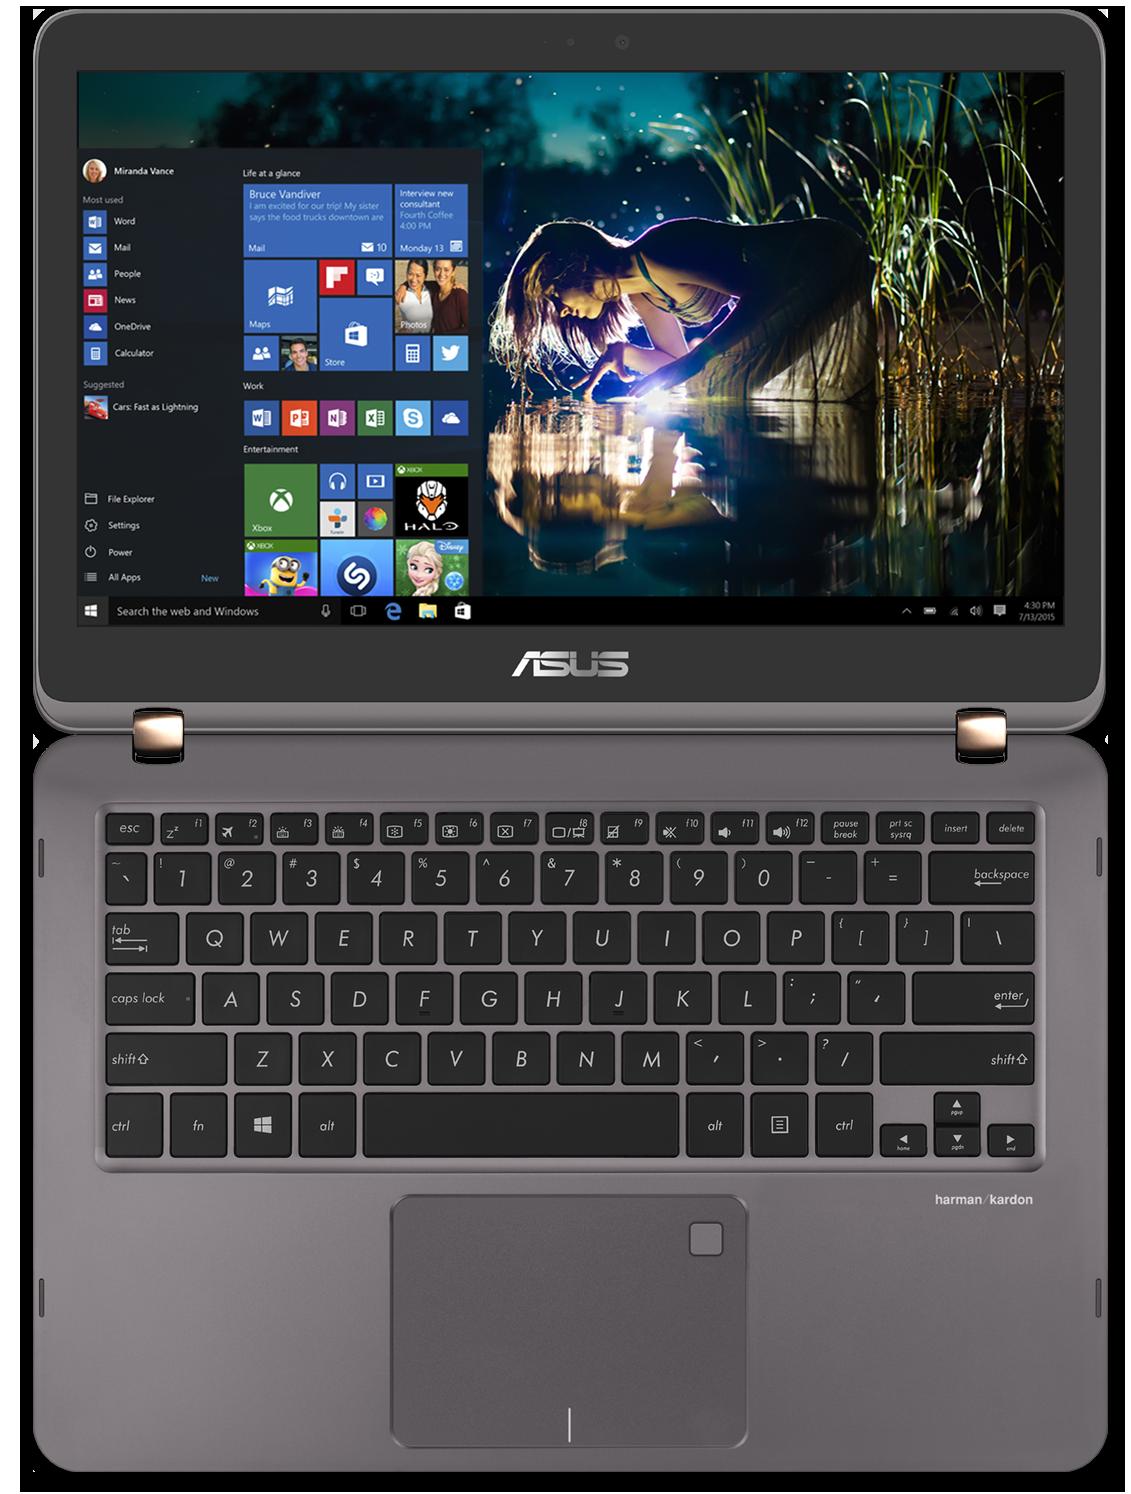 harman kardon laptop. Touch, Perfected. Harman Kardon Laptop S